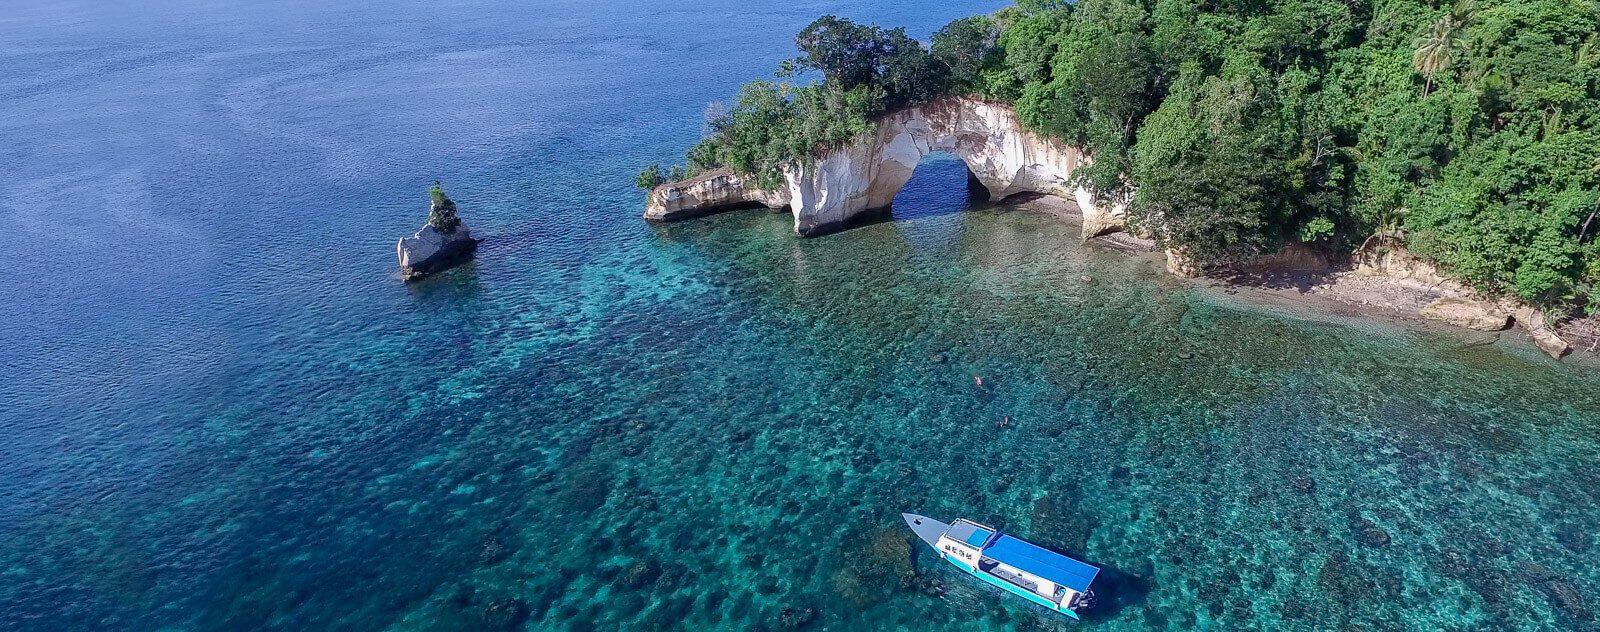 Coral Reef in Lembeh Strait